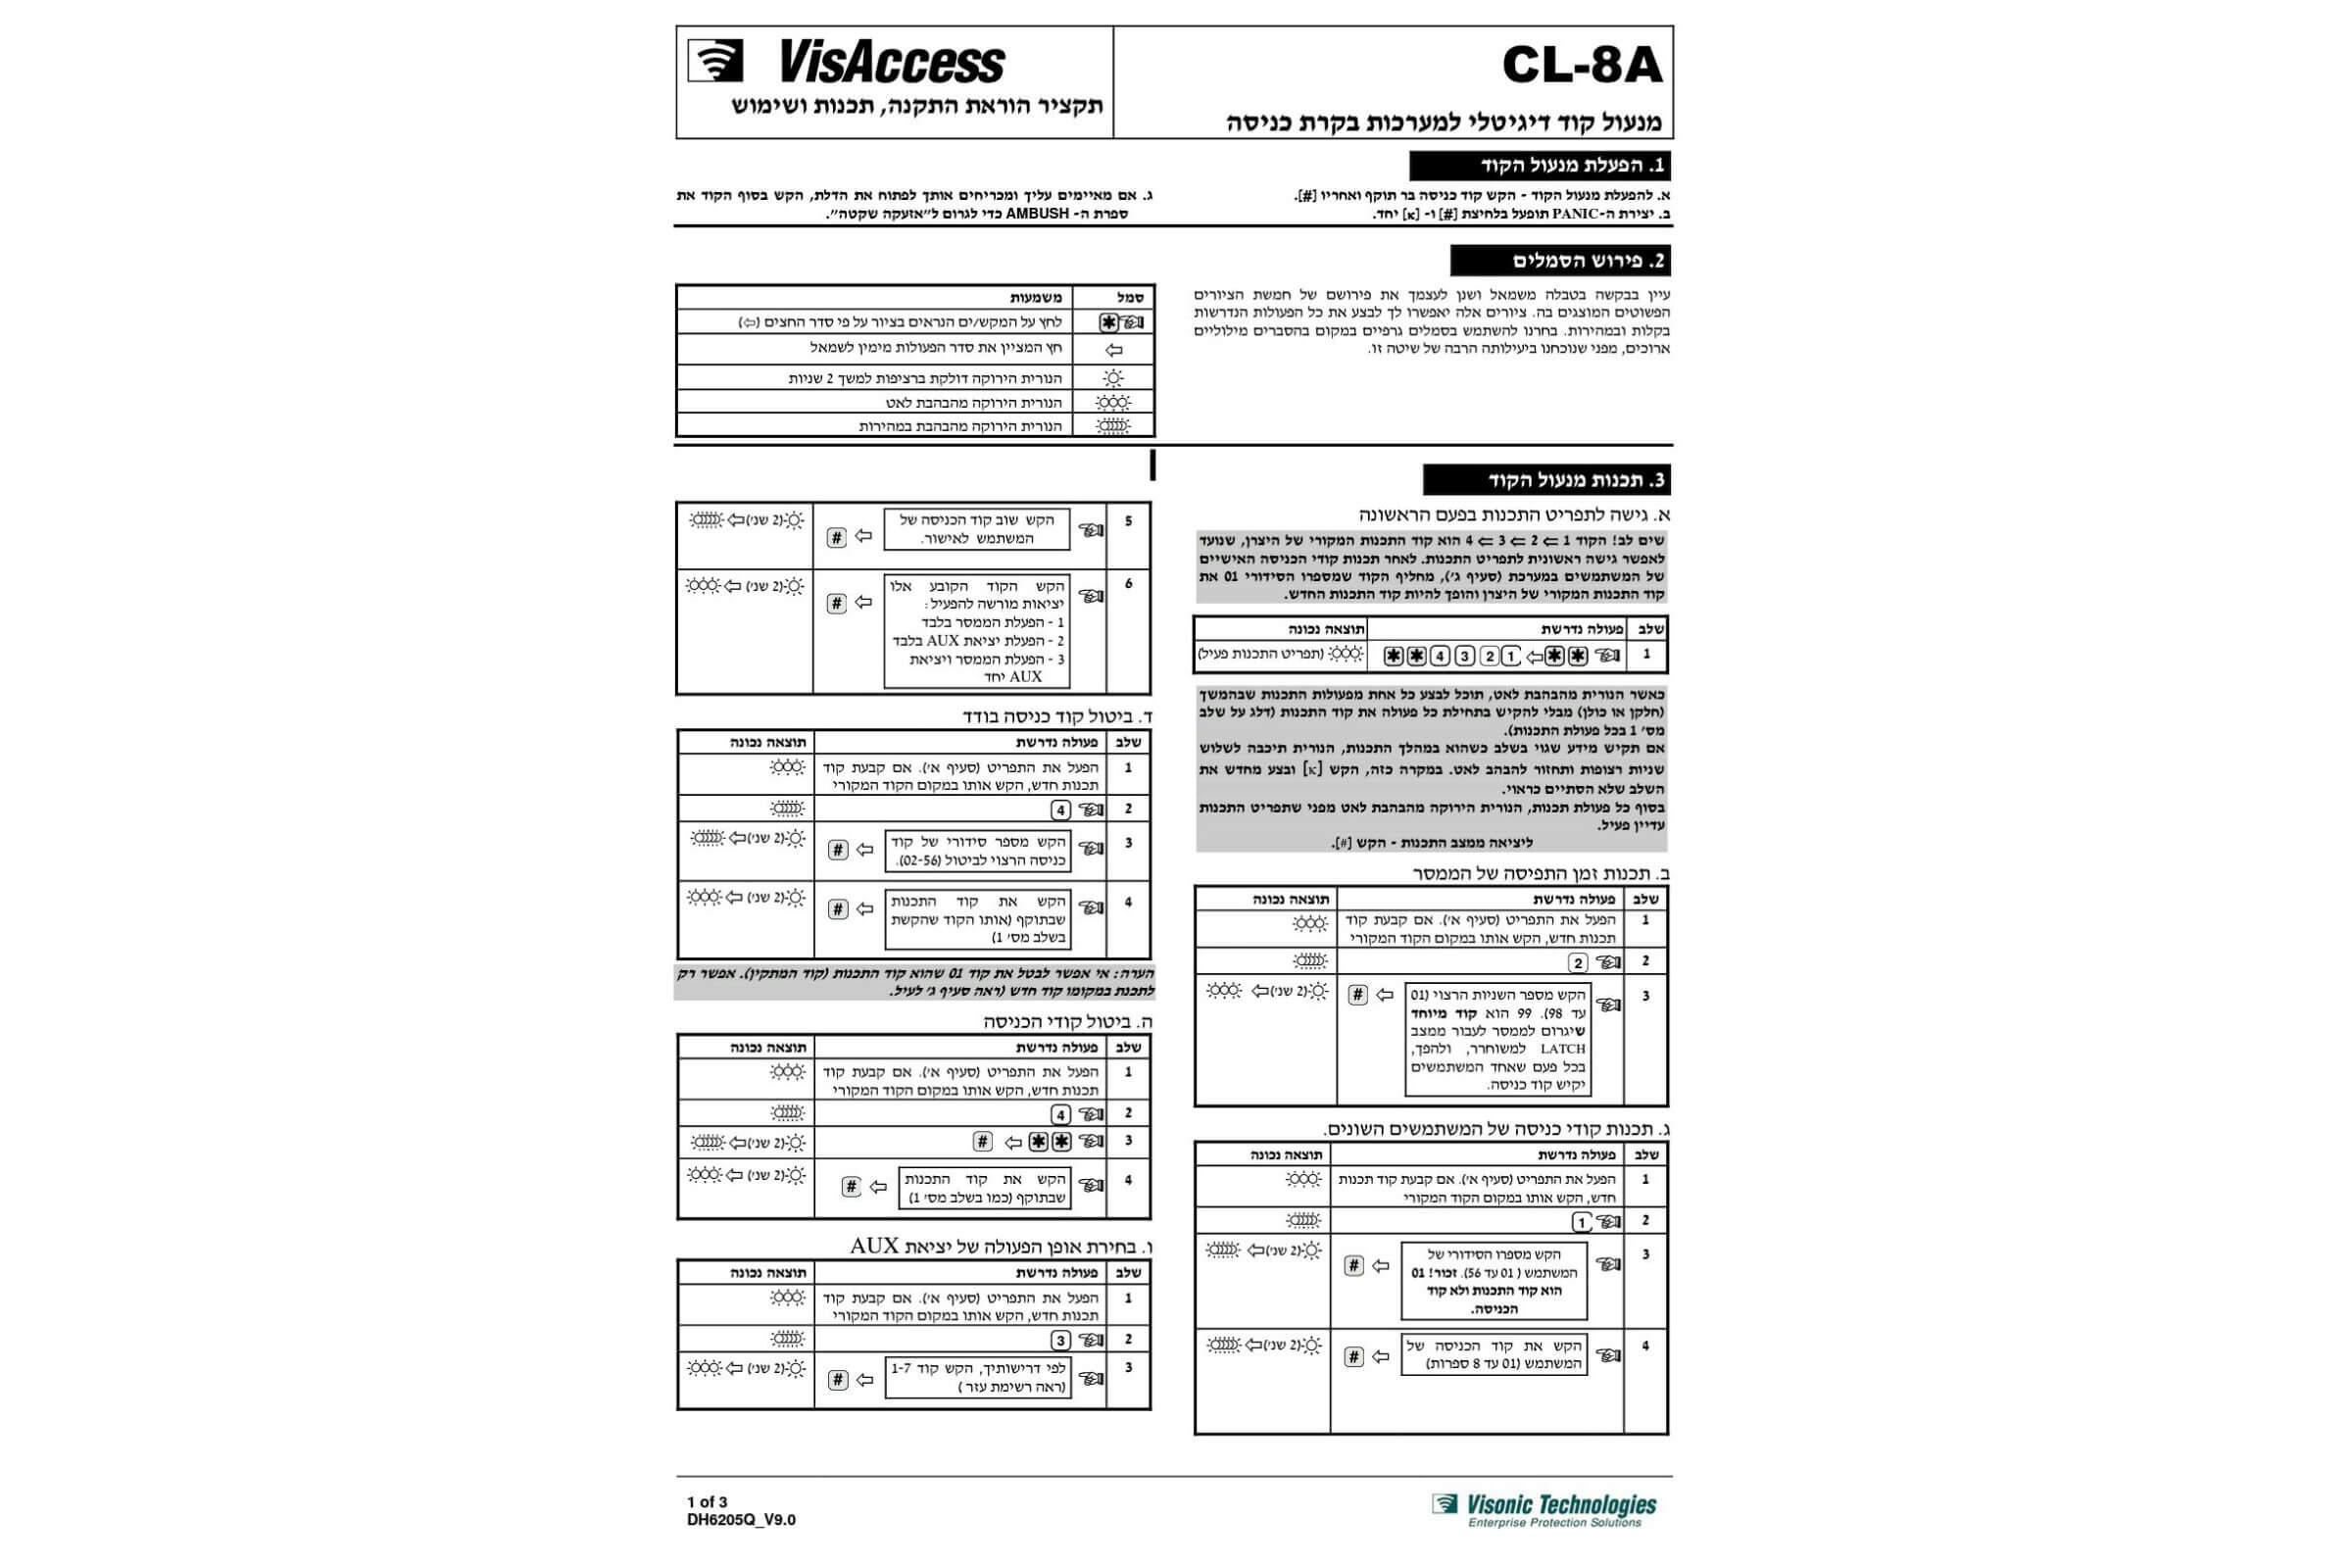 CL-8A